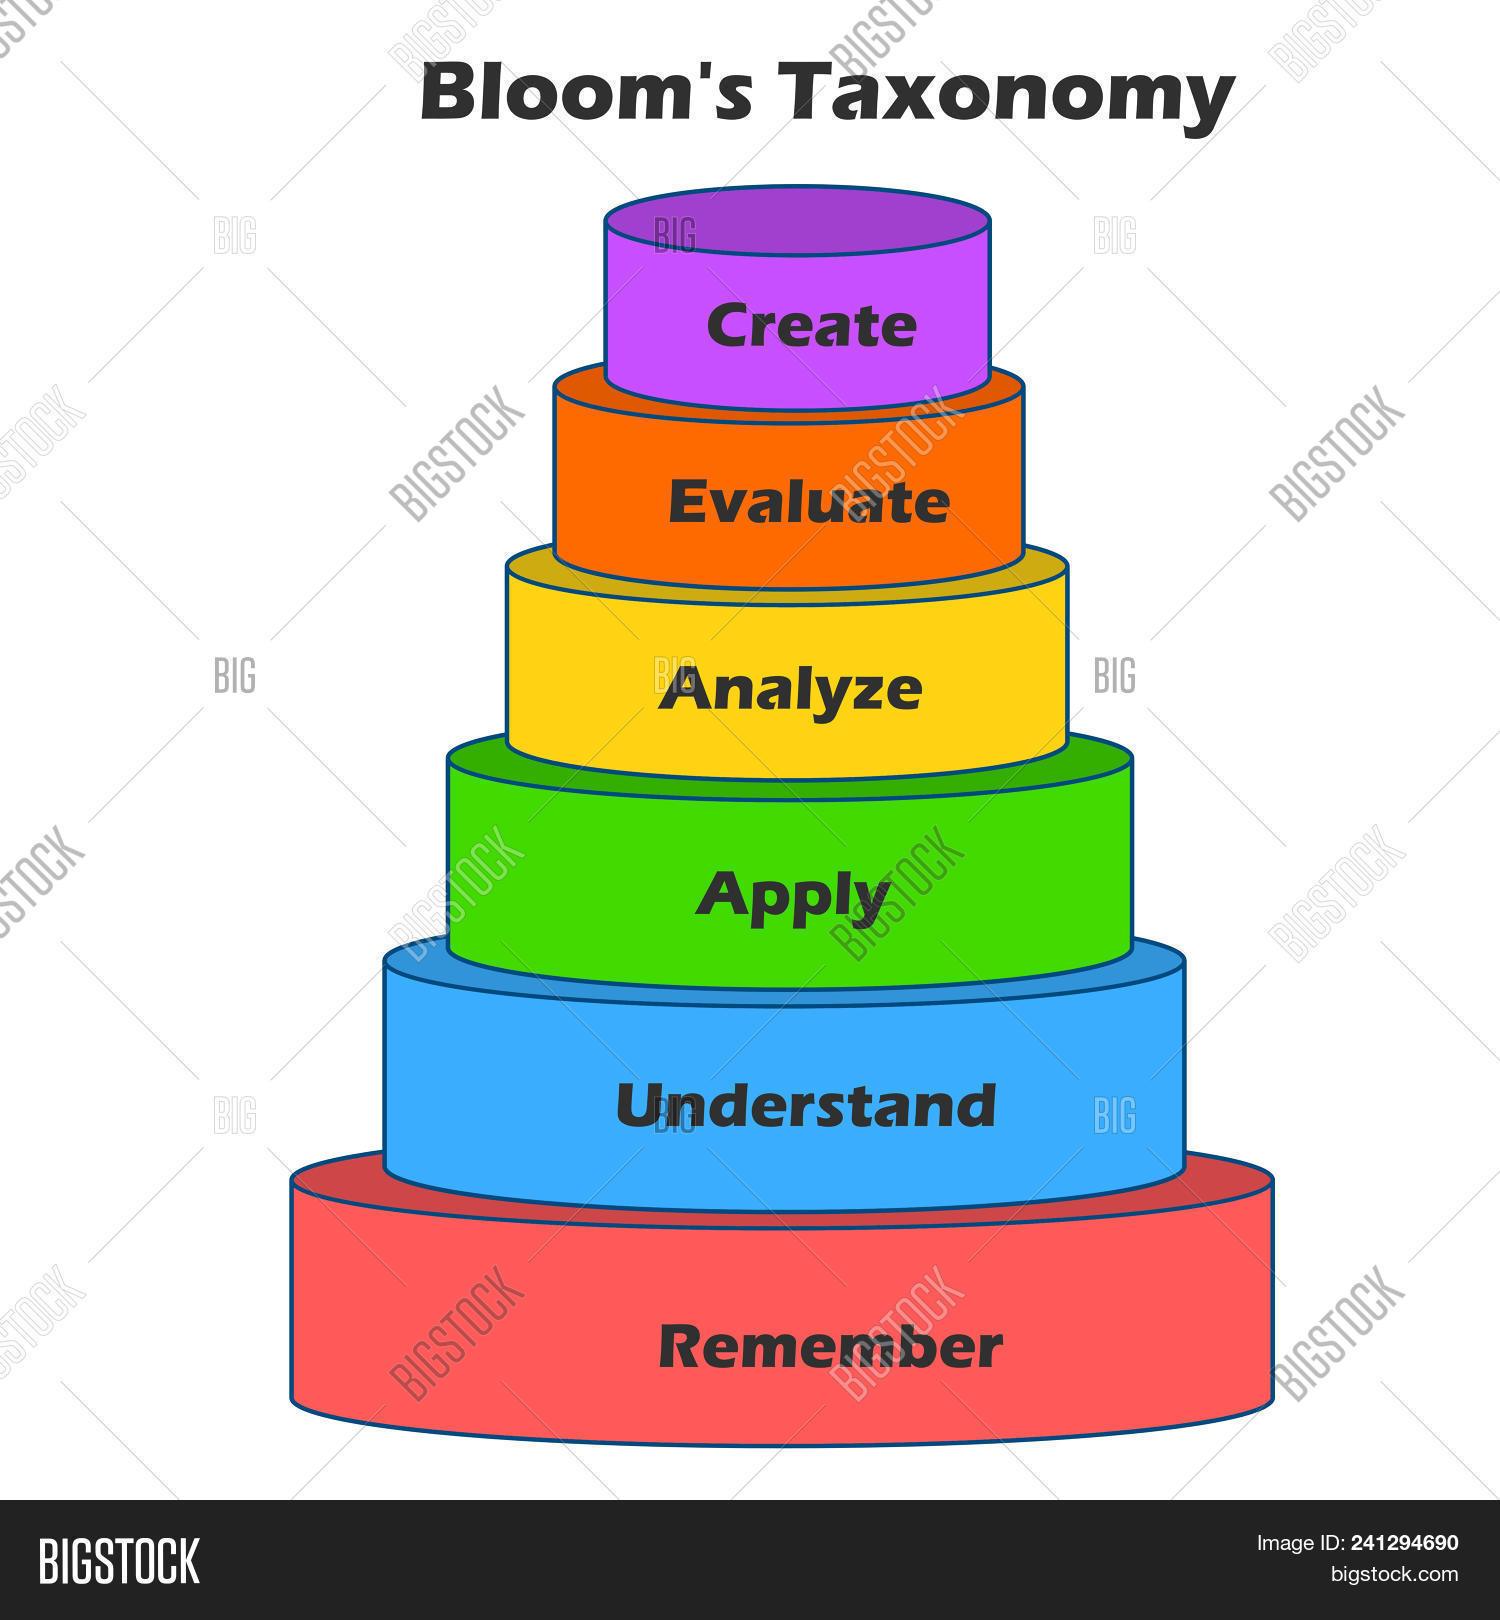 Bloom Taxonomy Pyramid Image Amp Photo Free Trial